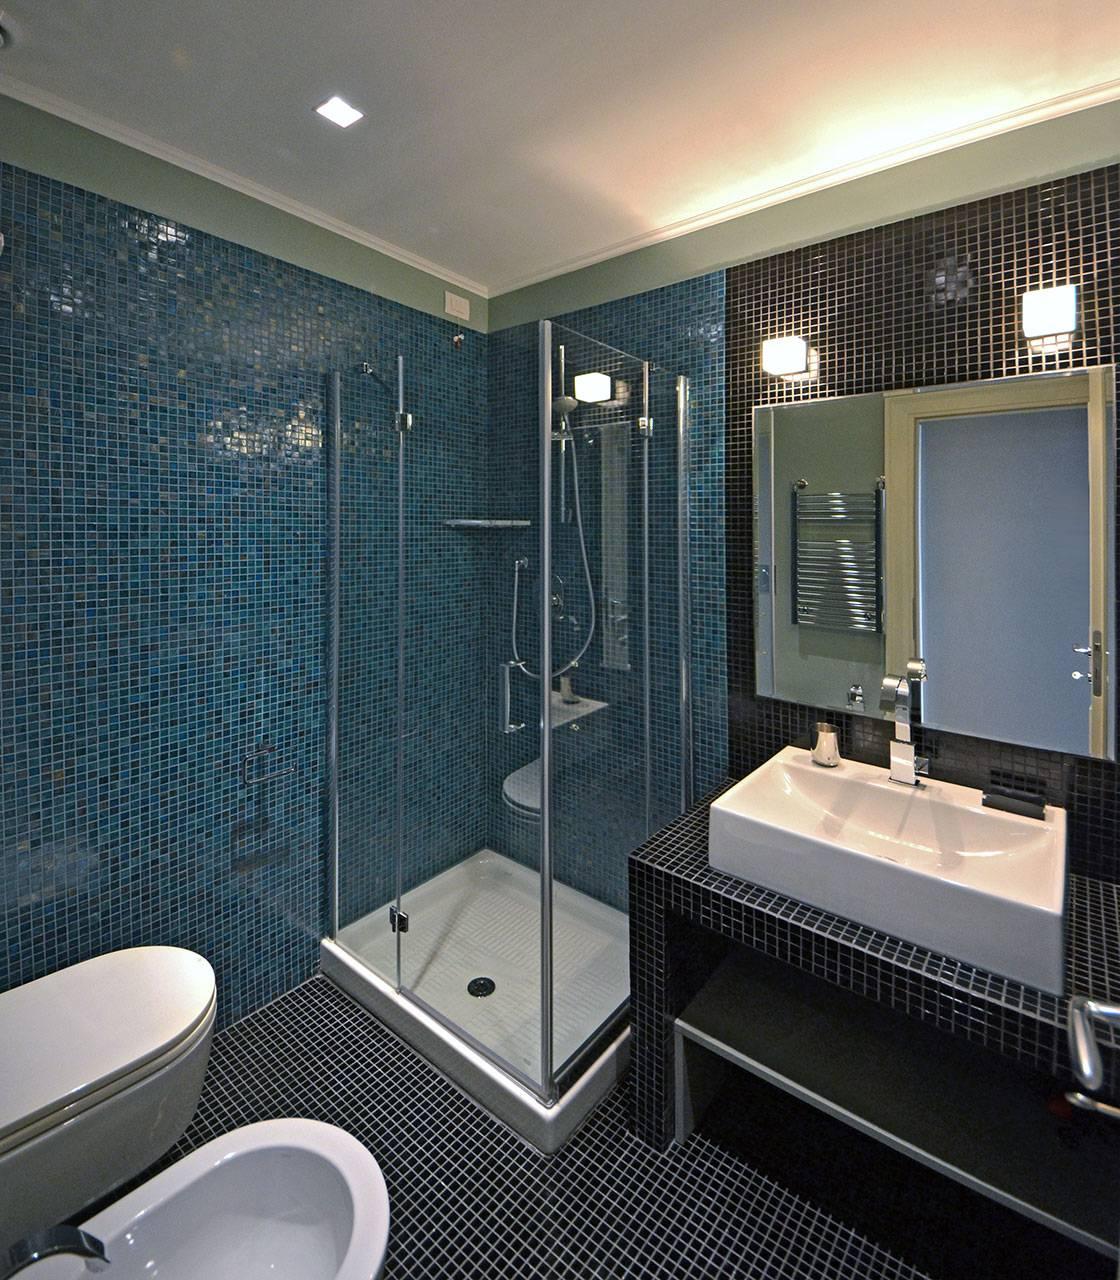 en-suite bathroom of the 3rd bedroom